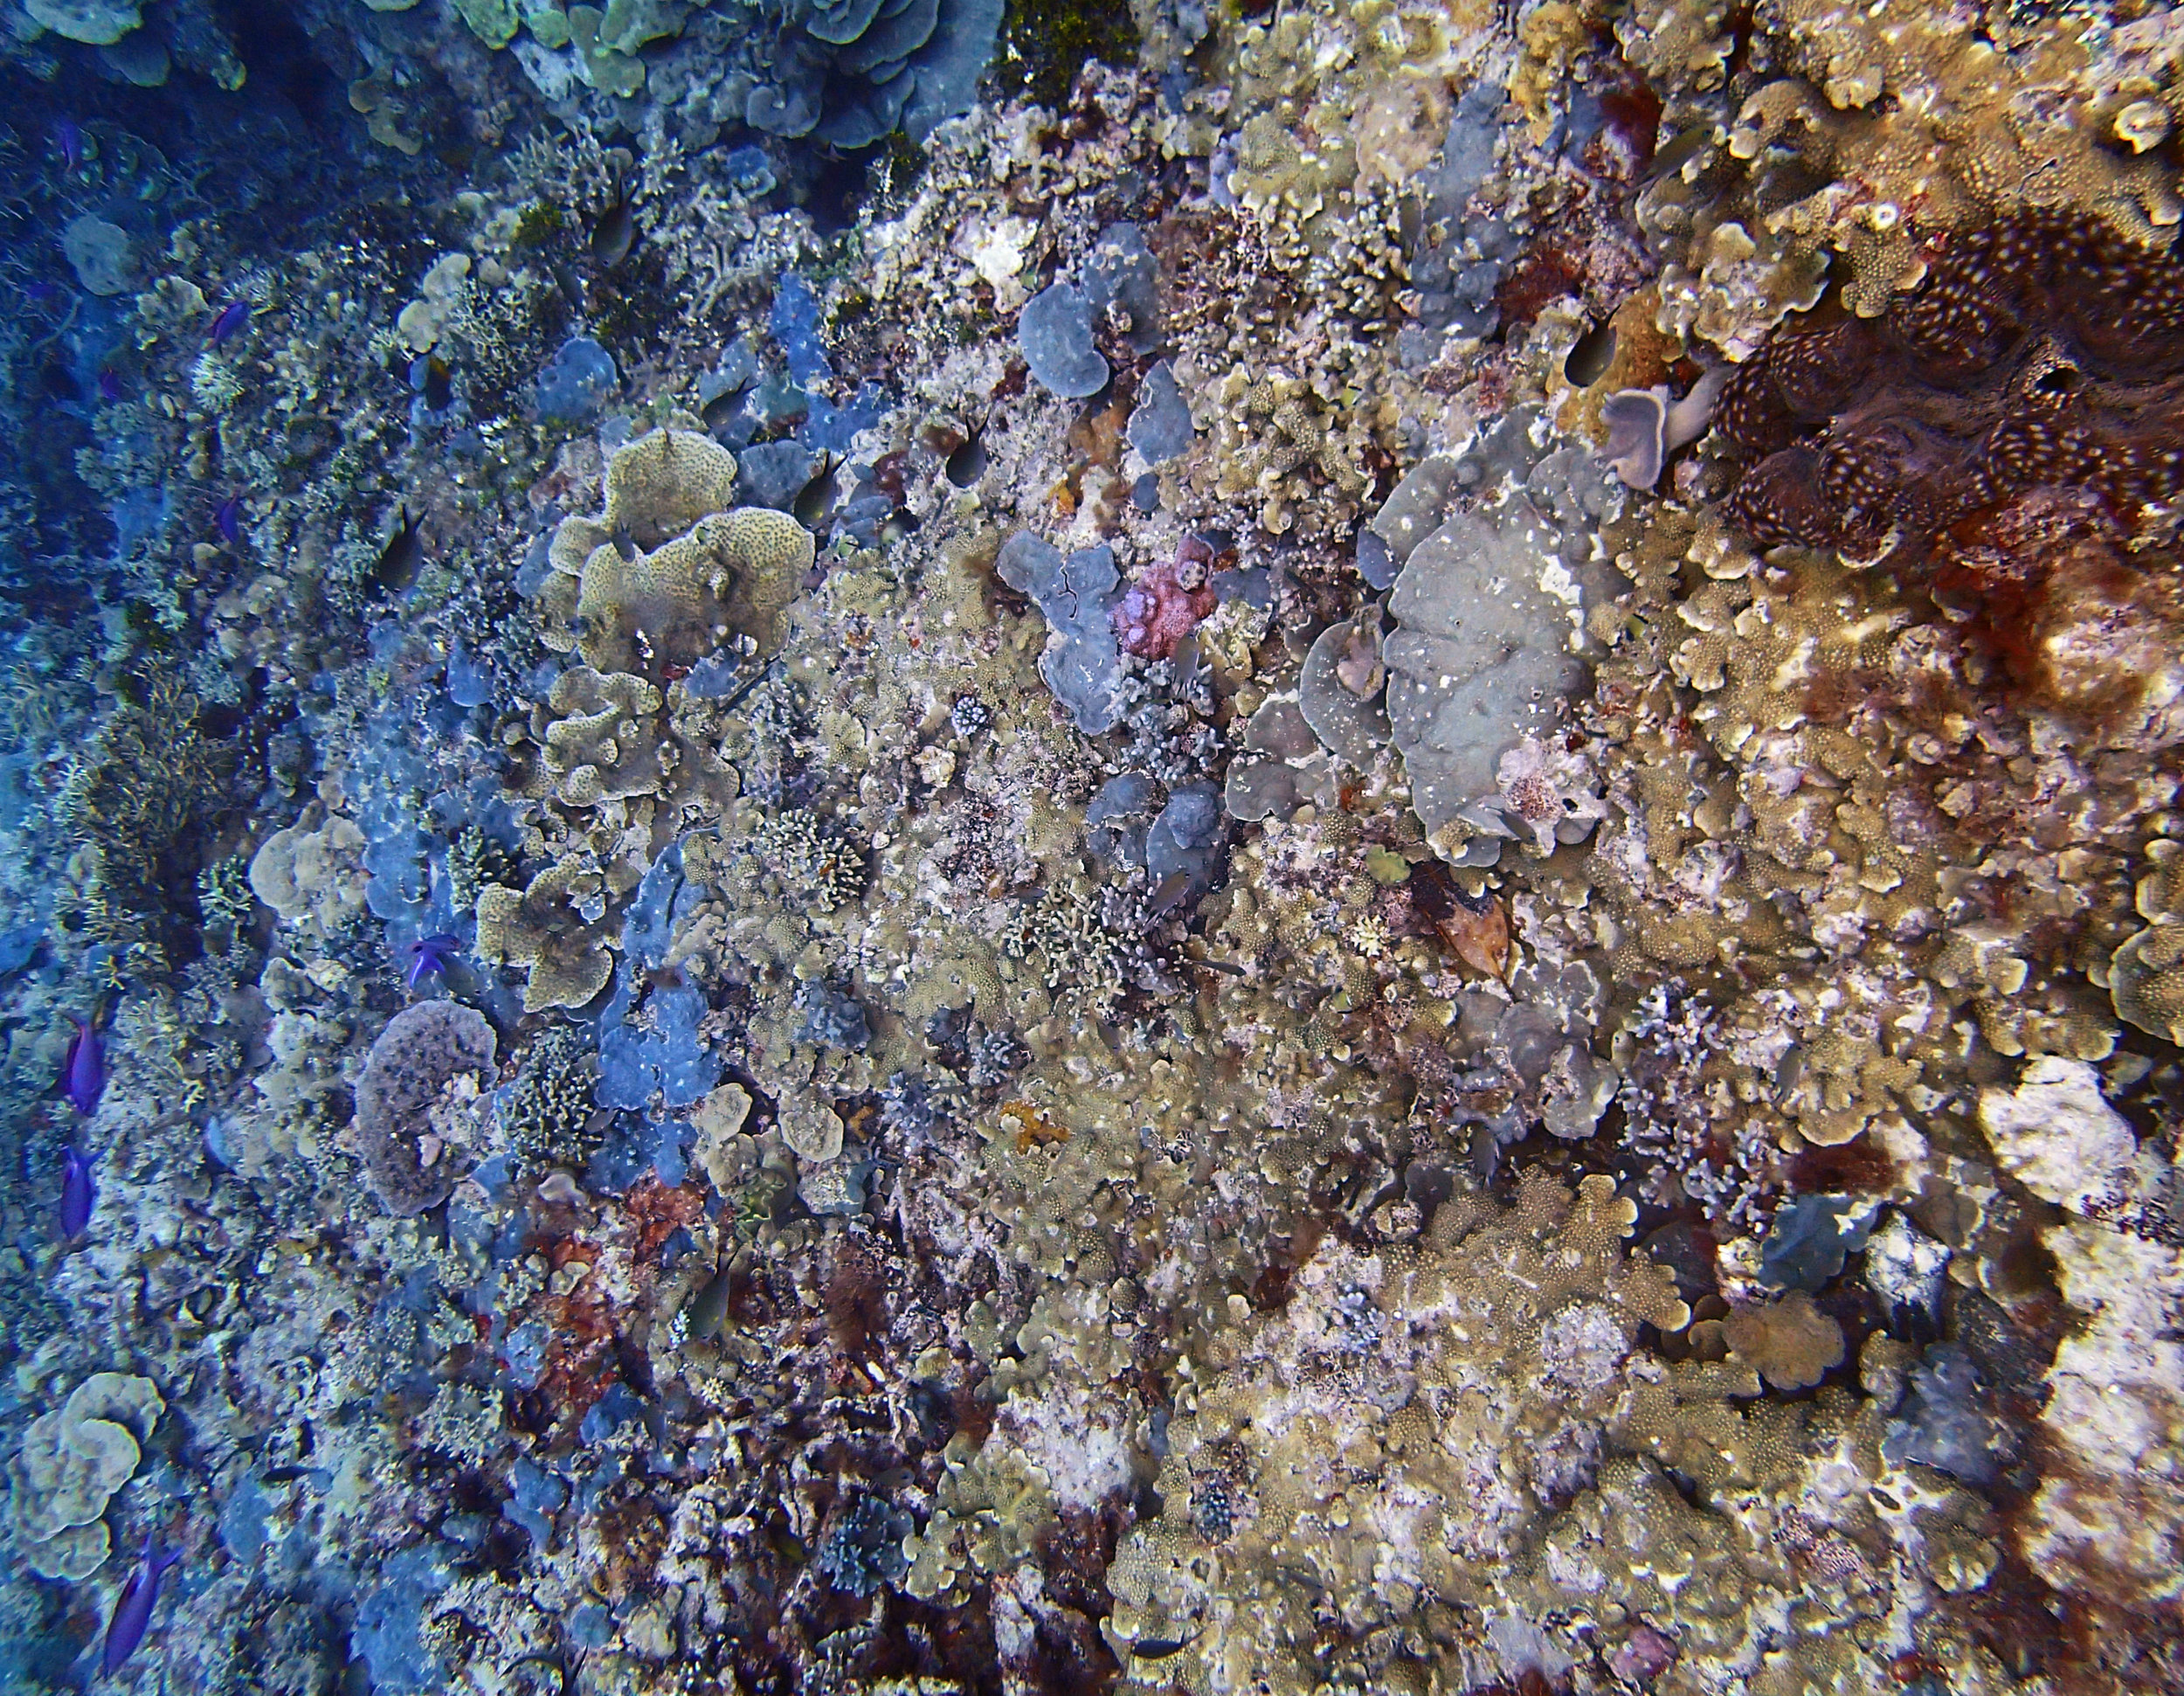 Reef Islands day 1 11-17-14.jpg